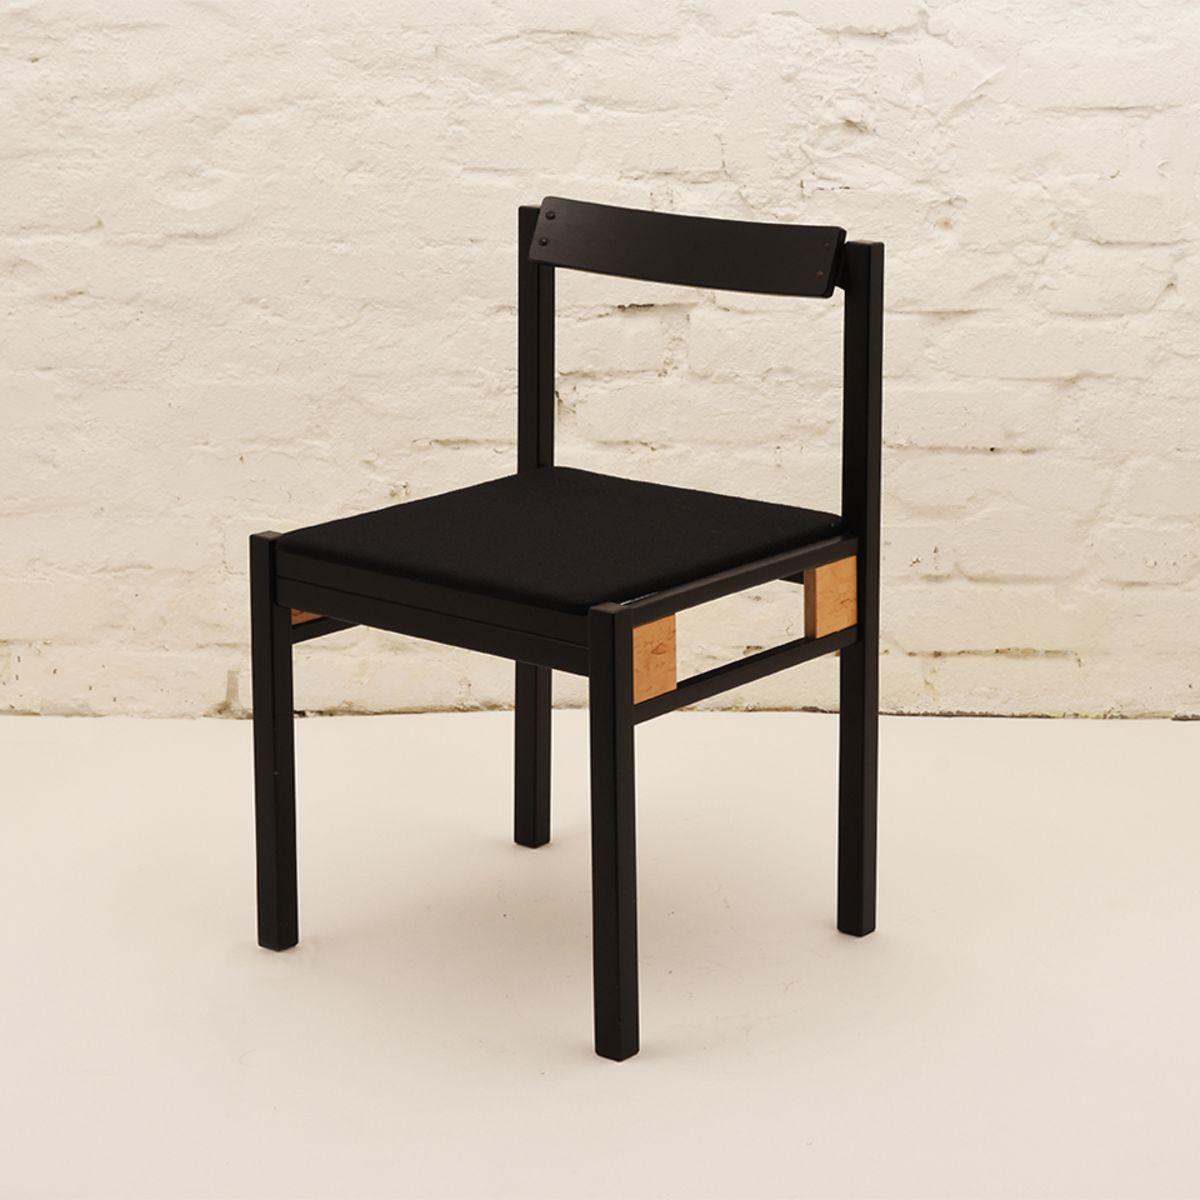 Yrjö-Kukkapuro-Chair